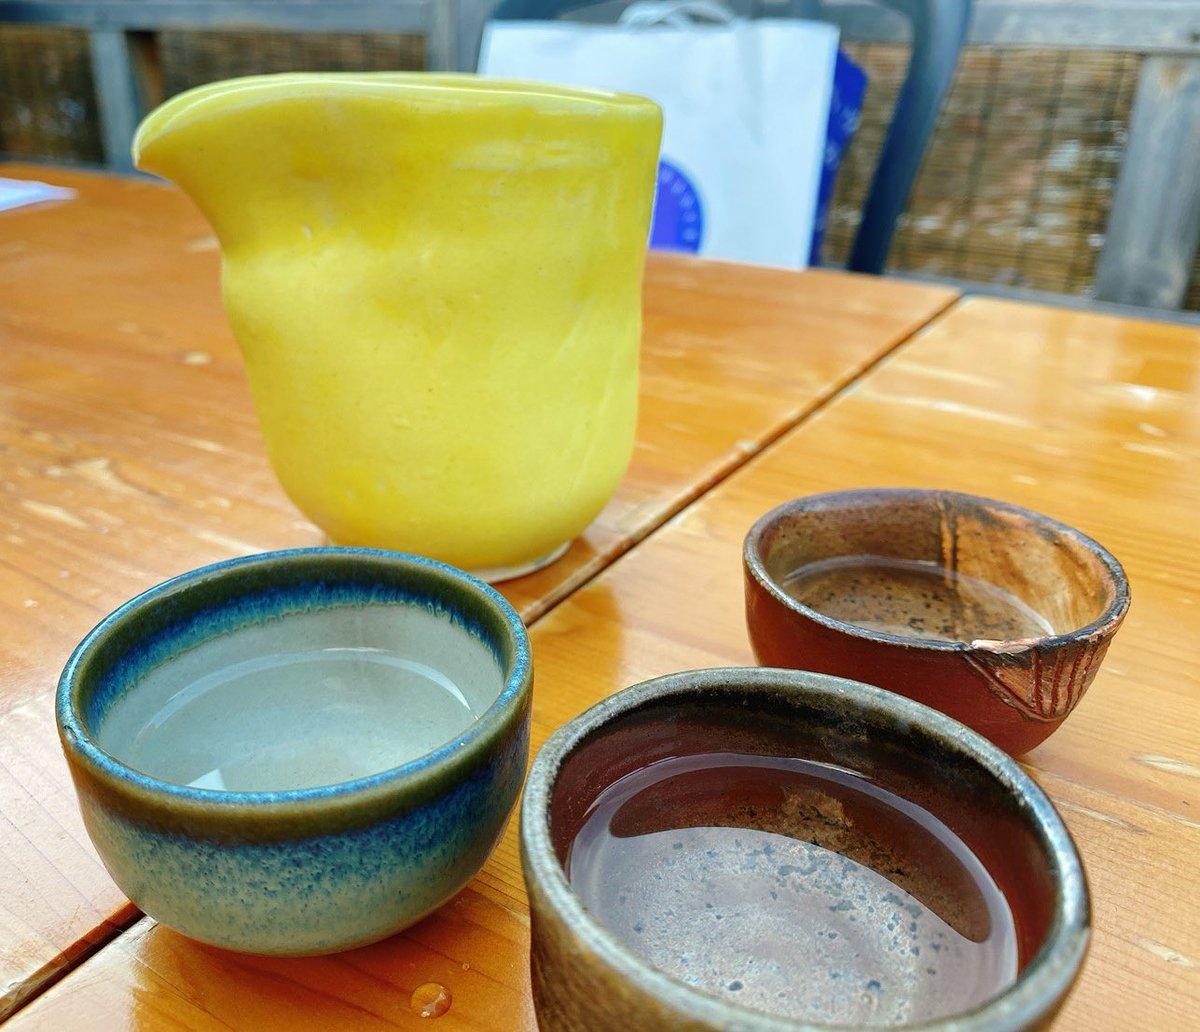 test ツイッターメディア - 毎夏恒例の納涼床🤡✨✨ 京都の夏ってかんじ☀️ 新政No.6 M-type ♡♡♡ フルーティーで少しスパークリングが入った日本酒🍶💕 https://t.co/F42qW7ys5k